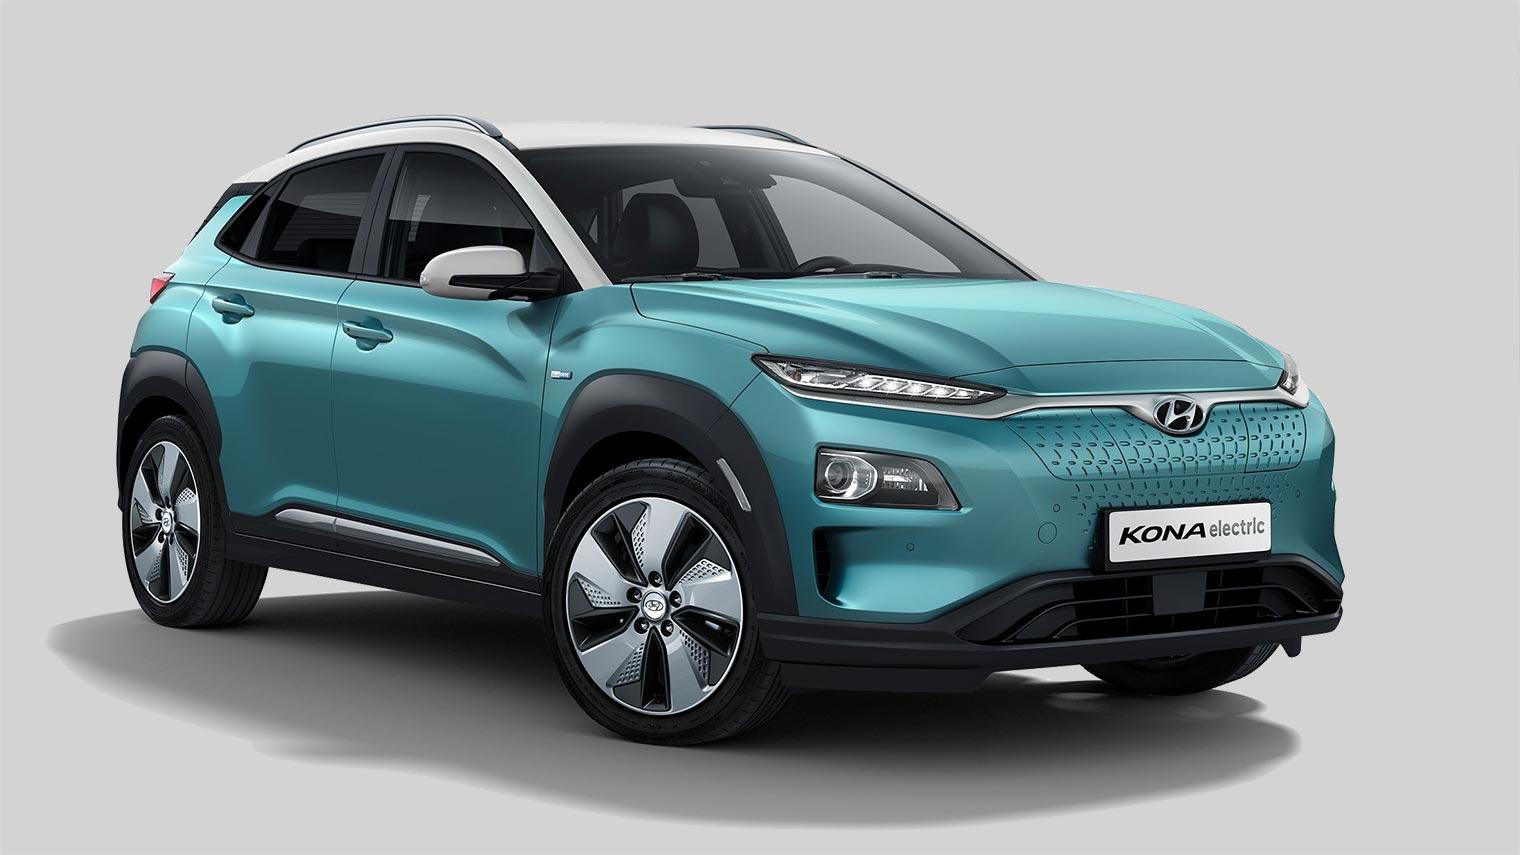 Hyundai KONA Electric 64 kWh + € 2.000,- subsidie @ANWB